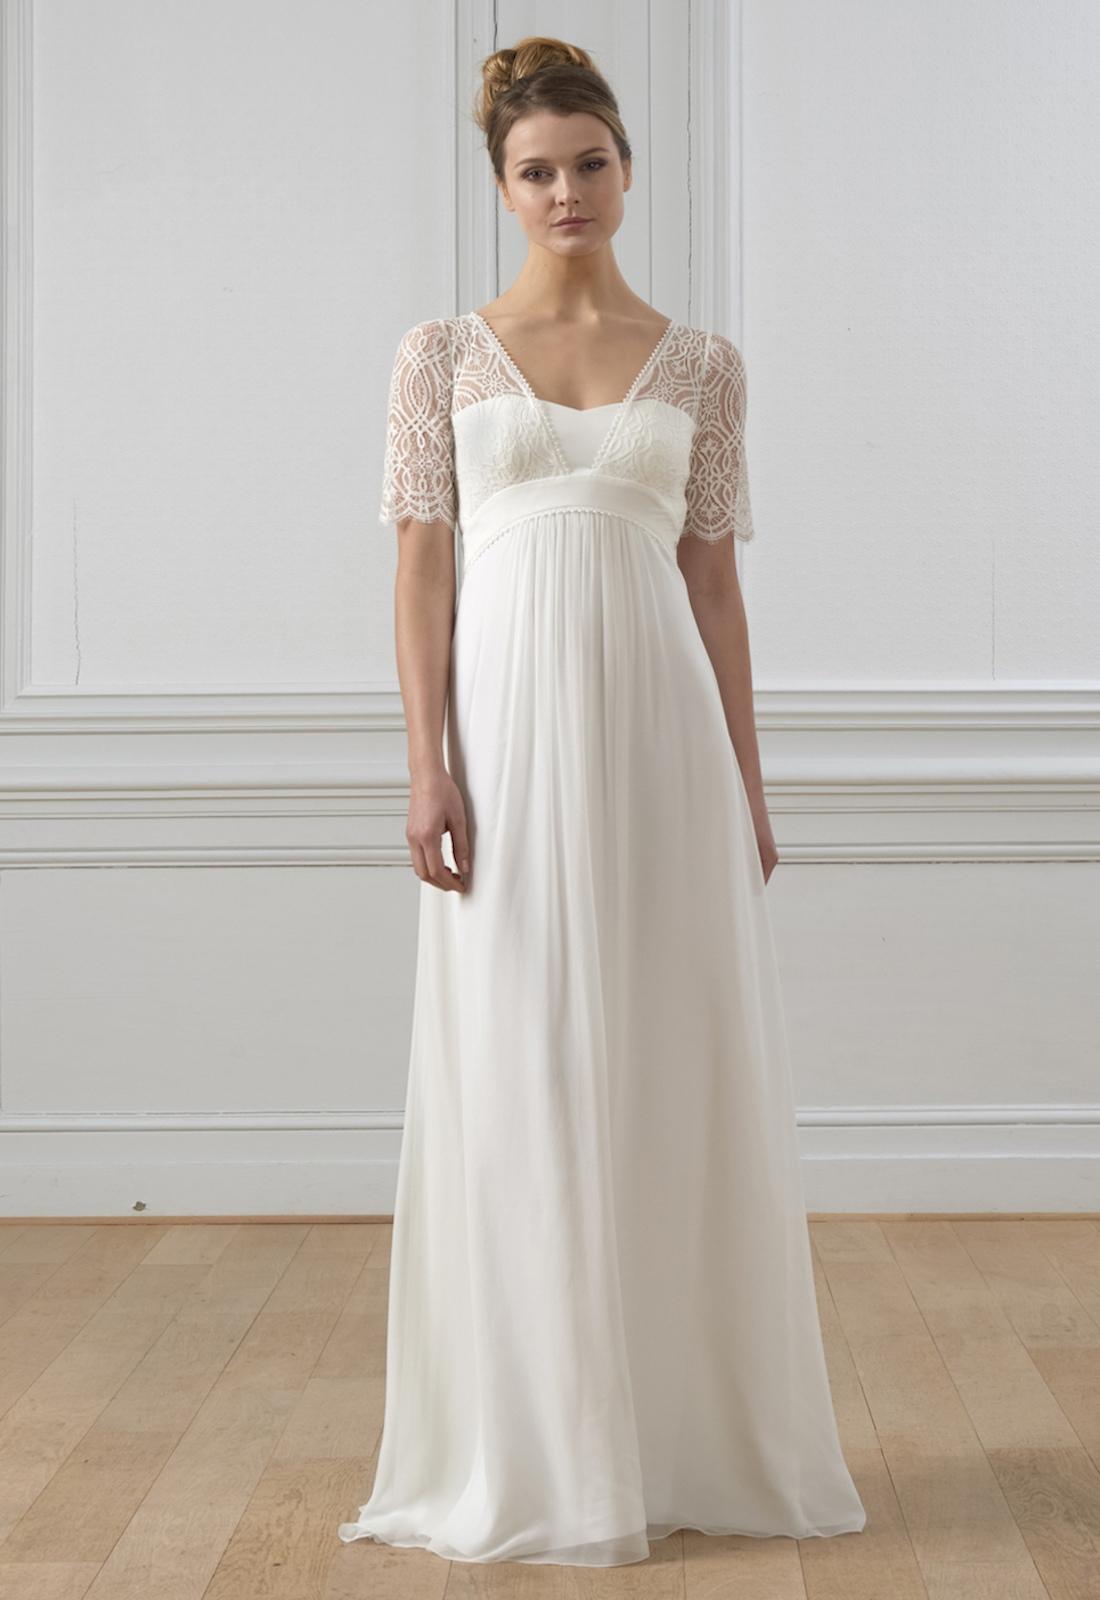 Robe Nice CréationsCaralys Bohème De Mariage Mariée Lambert Olympe 8wOZN0XknP